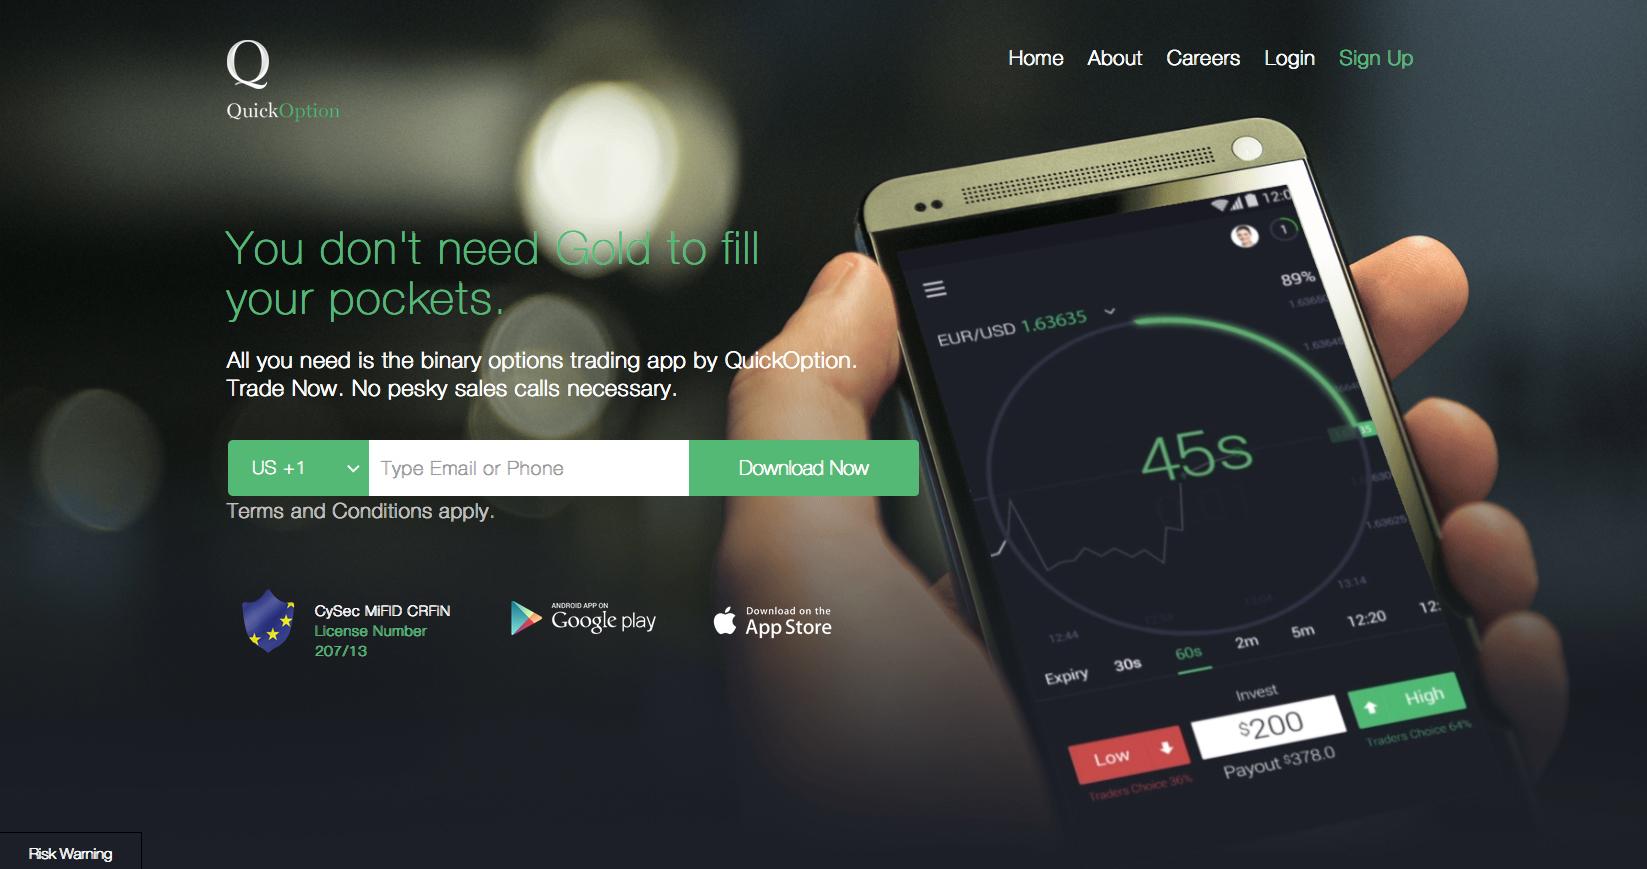 Quick Option app website